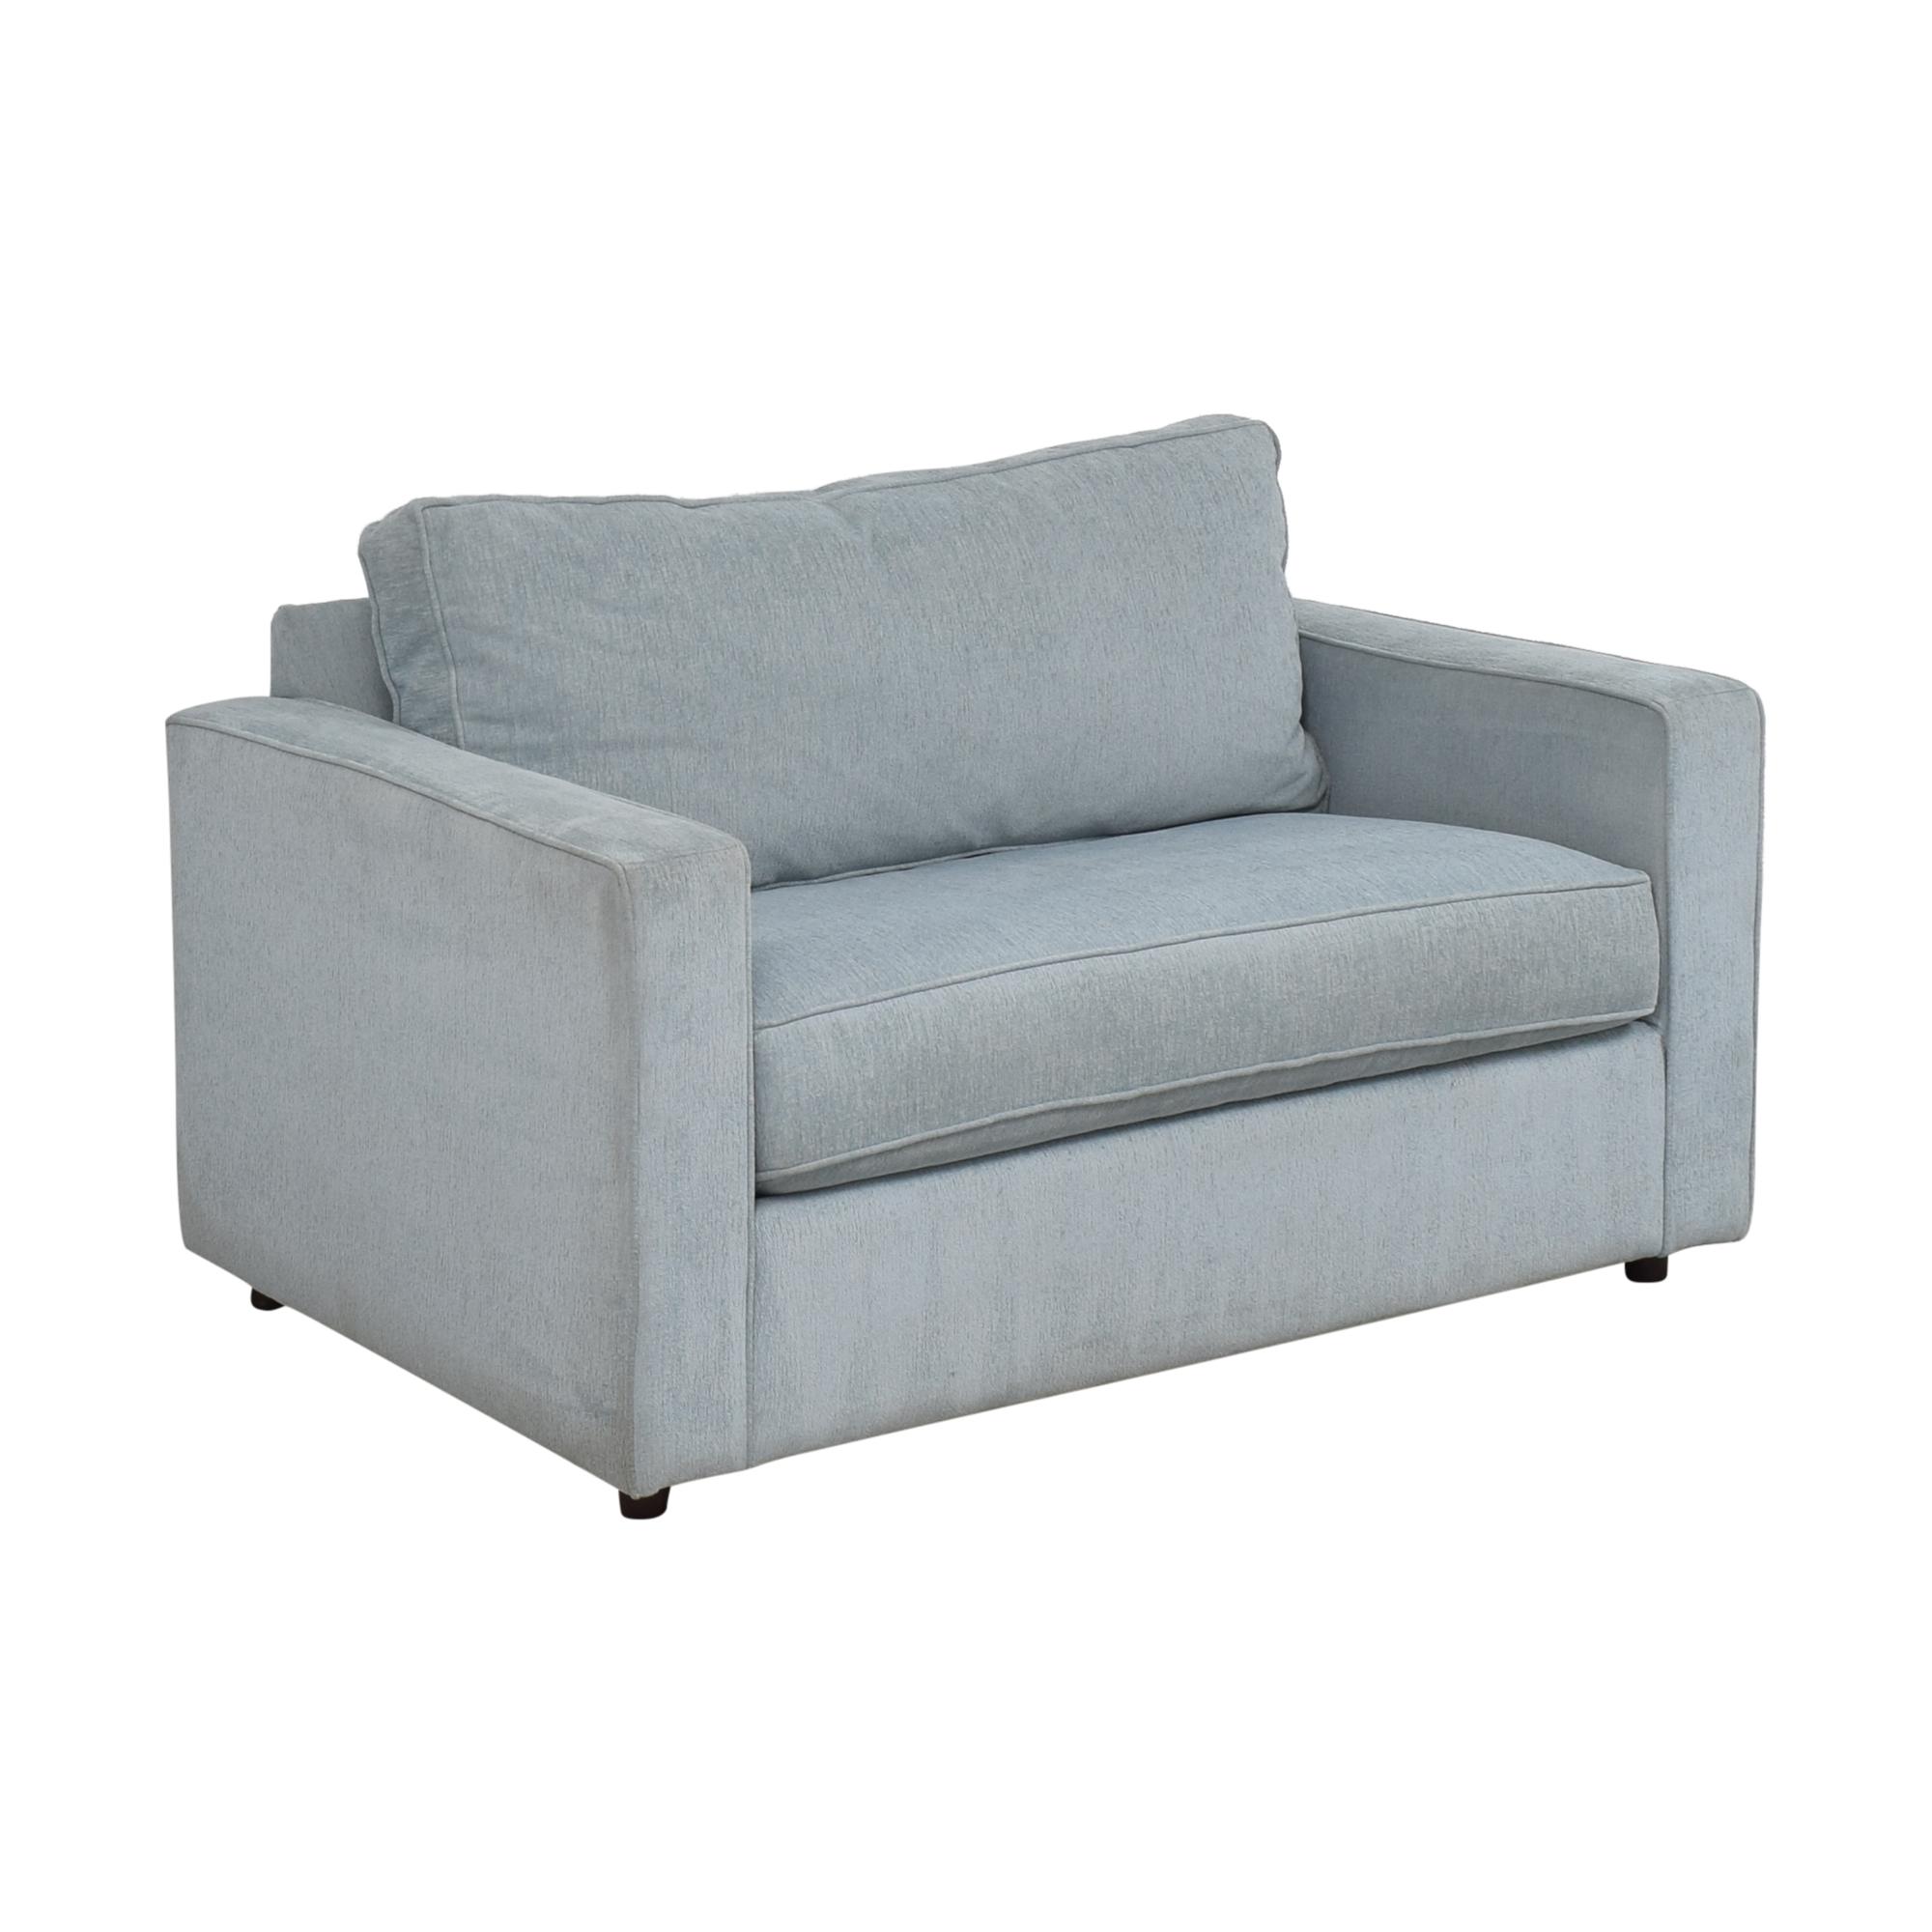 Arhaus Arhaus Filmore Twin Sleeper Chair Sofas